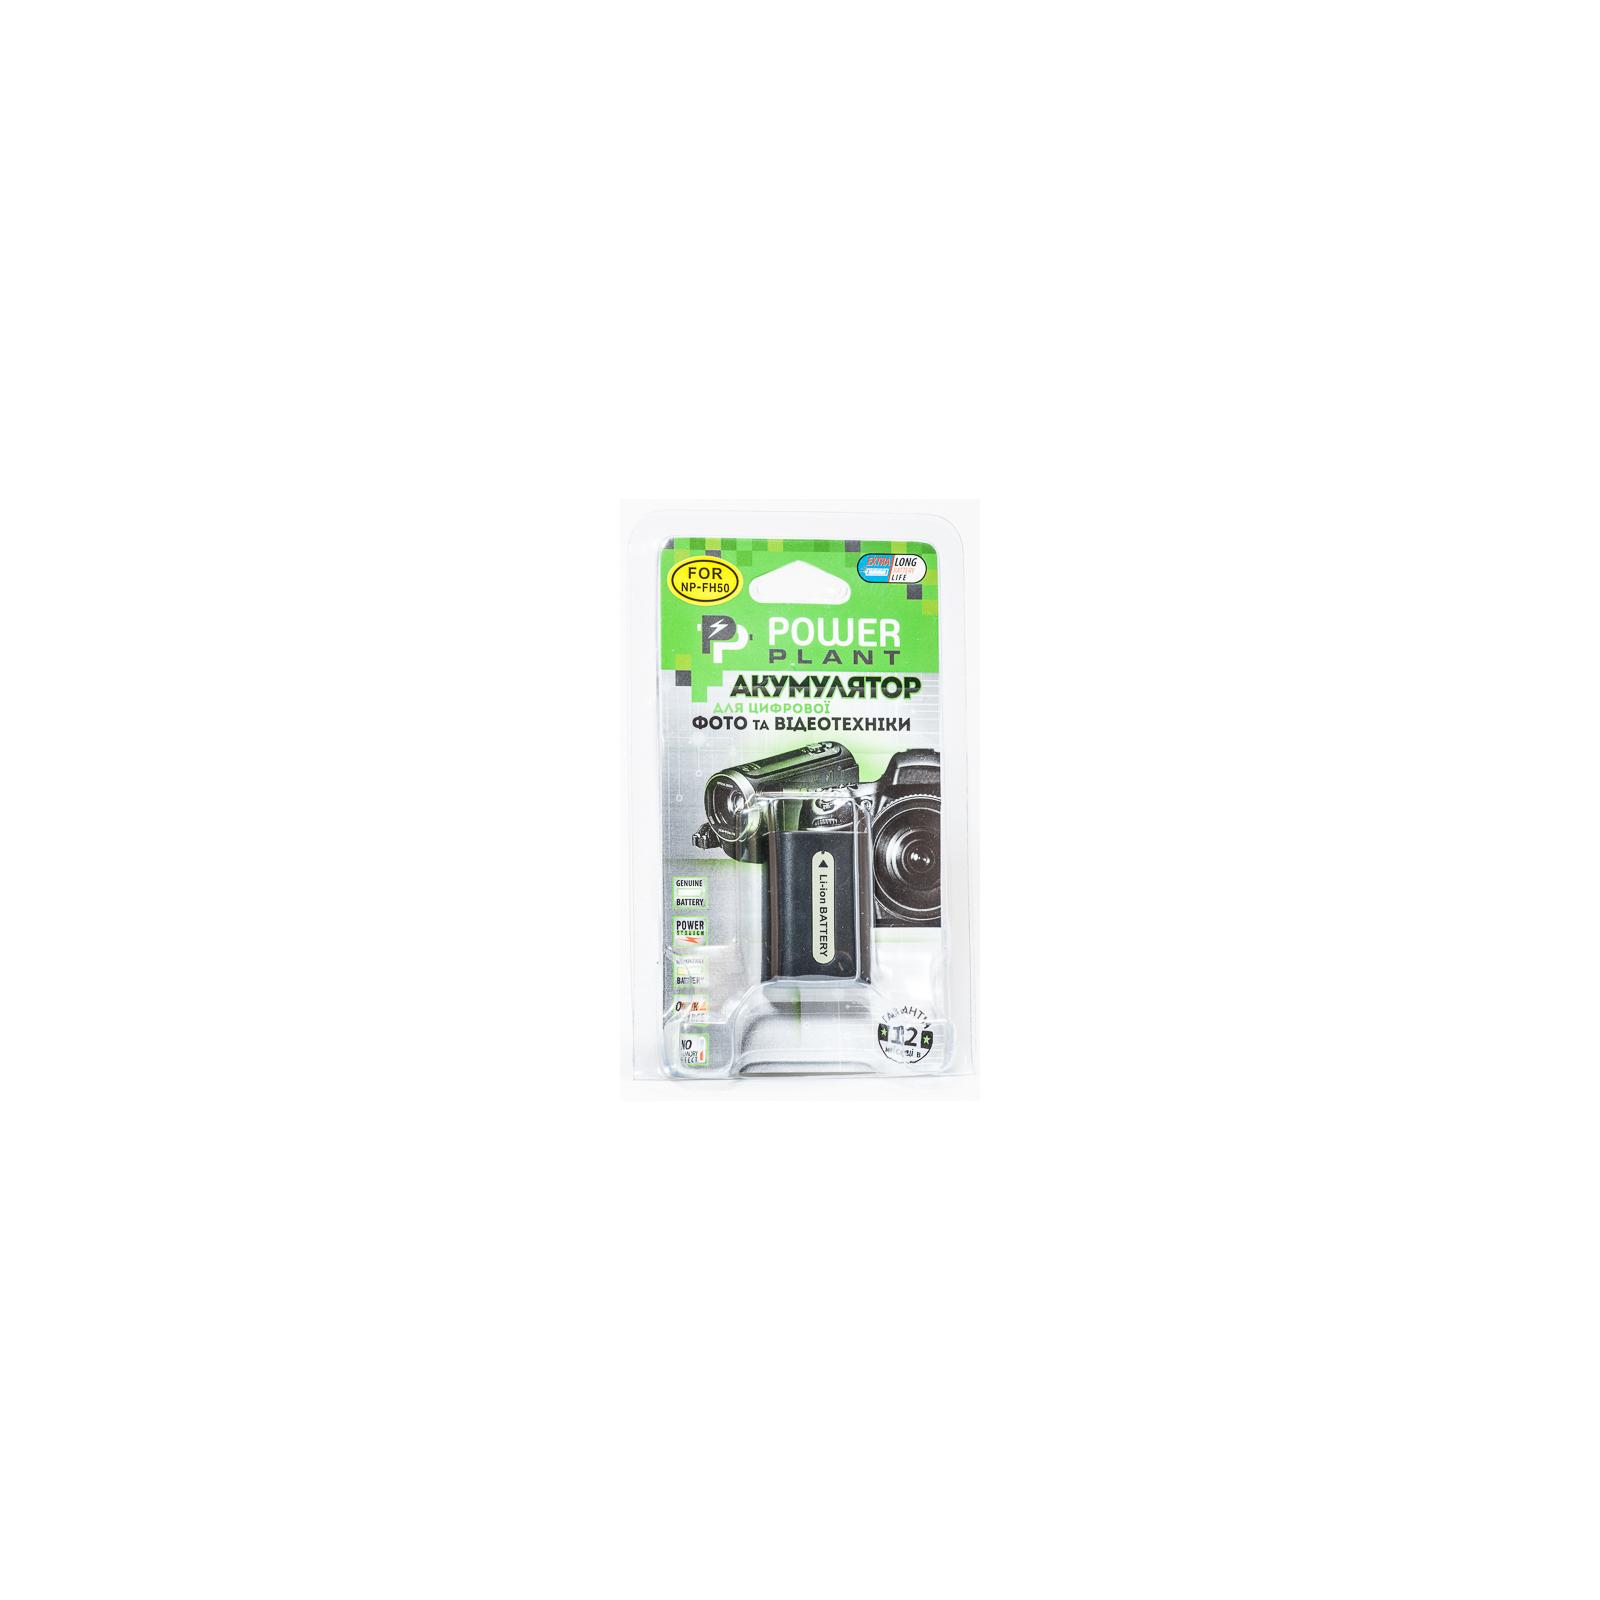 Аккумулятор к фото/видео PowerPlant Sony NP-FH50 (DV00DV1208) изображение 3